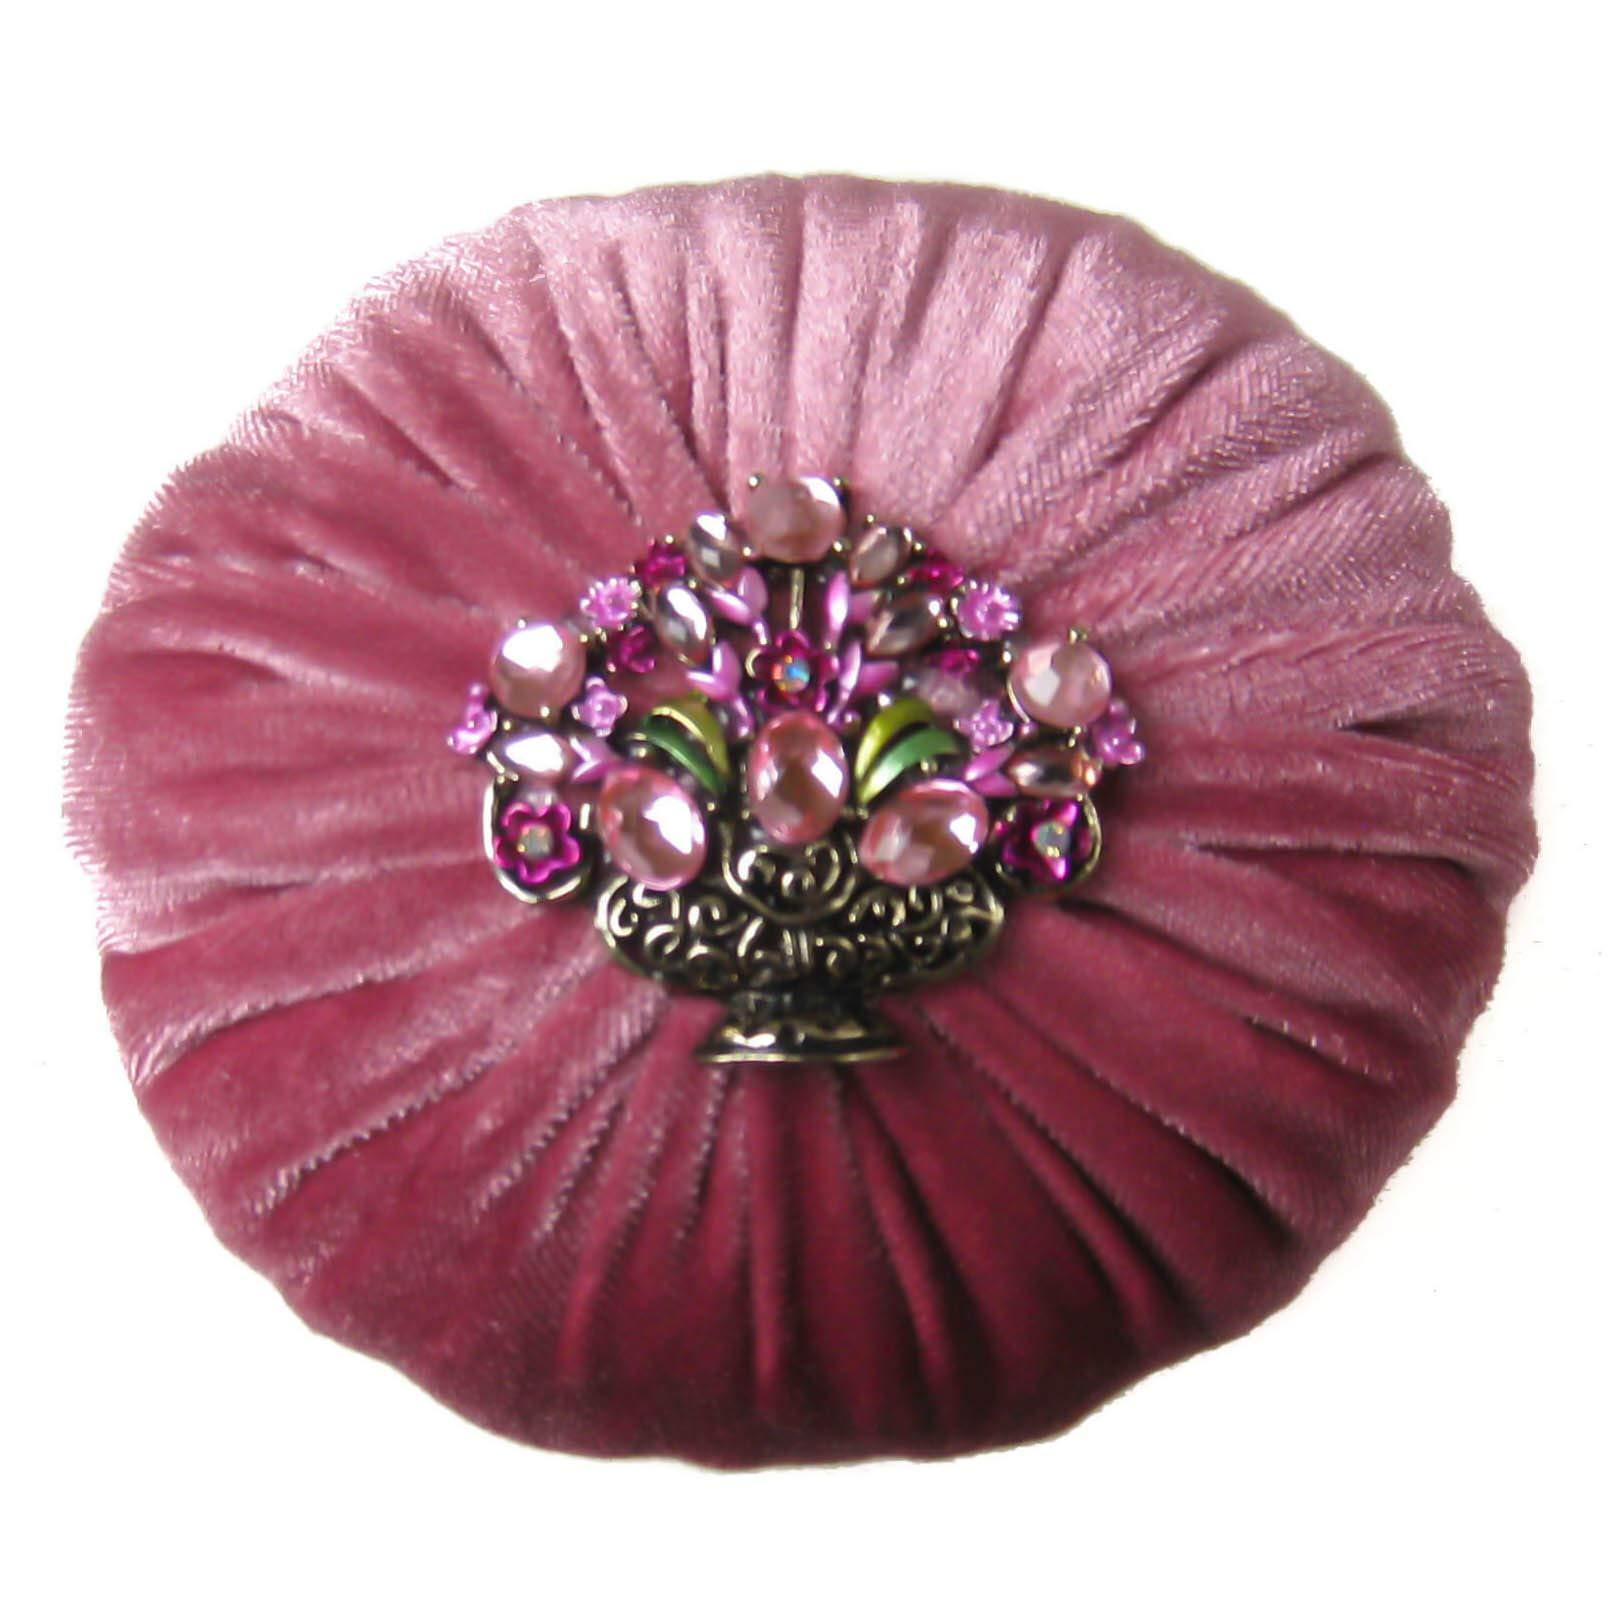 Nakpunar 4'' Mauve Pink Velvet Emery Pincushion - Keep Your Needles Clean & Sharp (4'', Mauve Pink) by Nakpunar